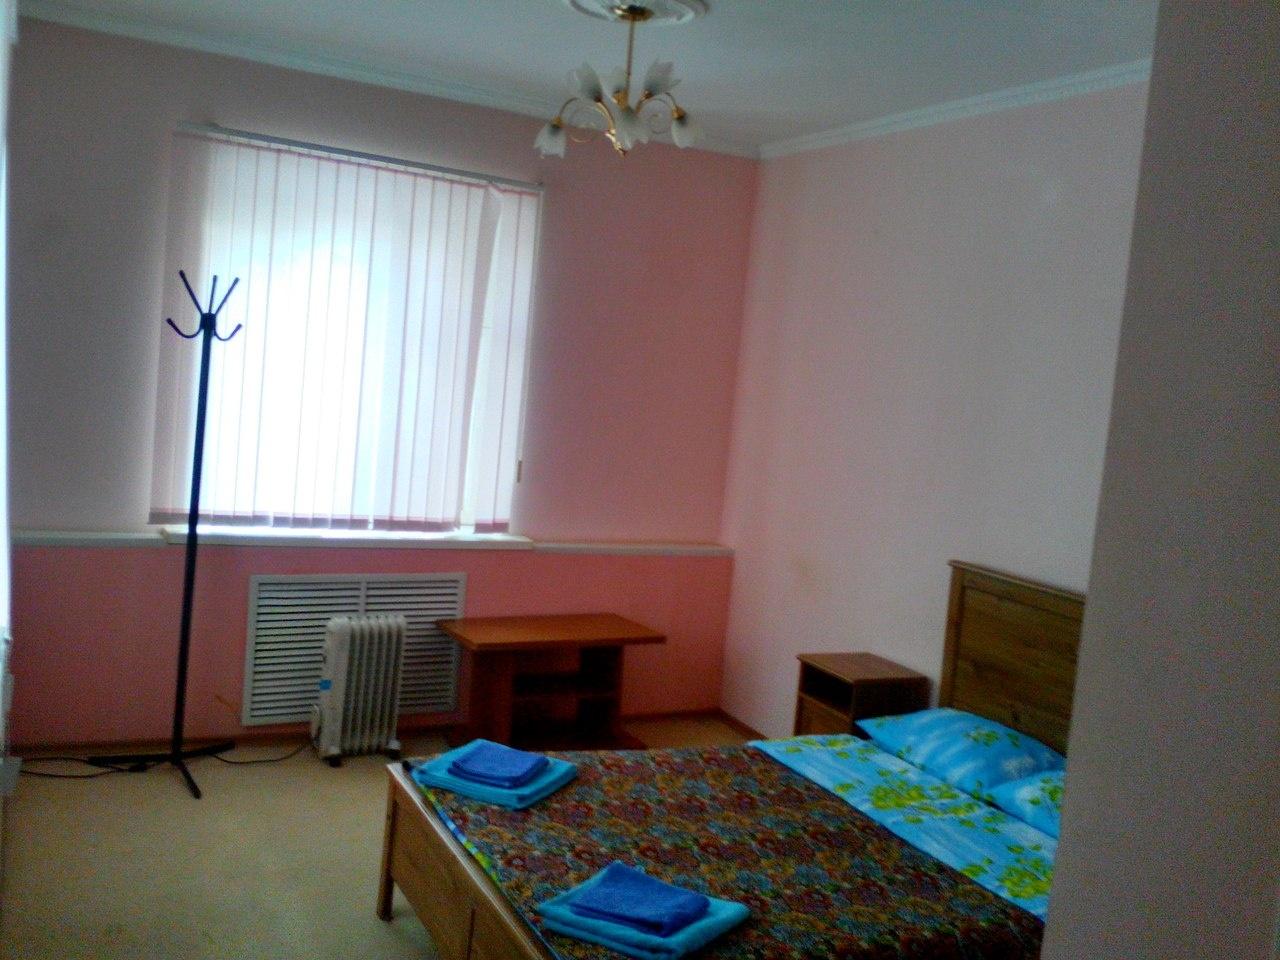 Дом отдыха «Берсут» Республика Татарстан Коттедж, фото 5